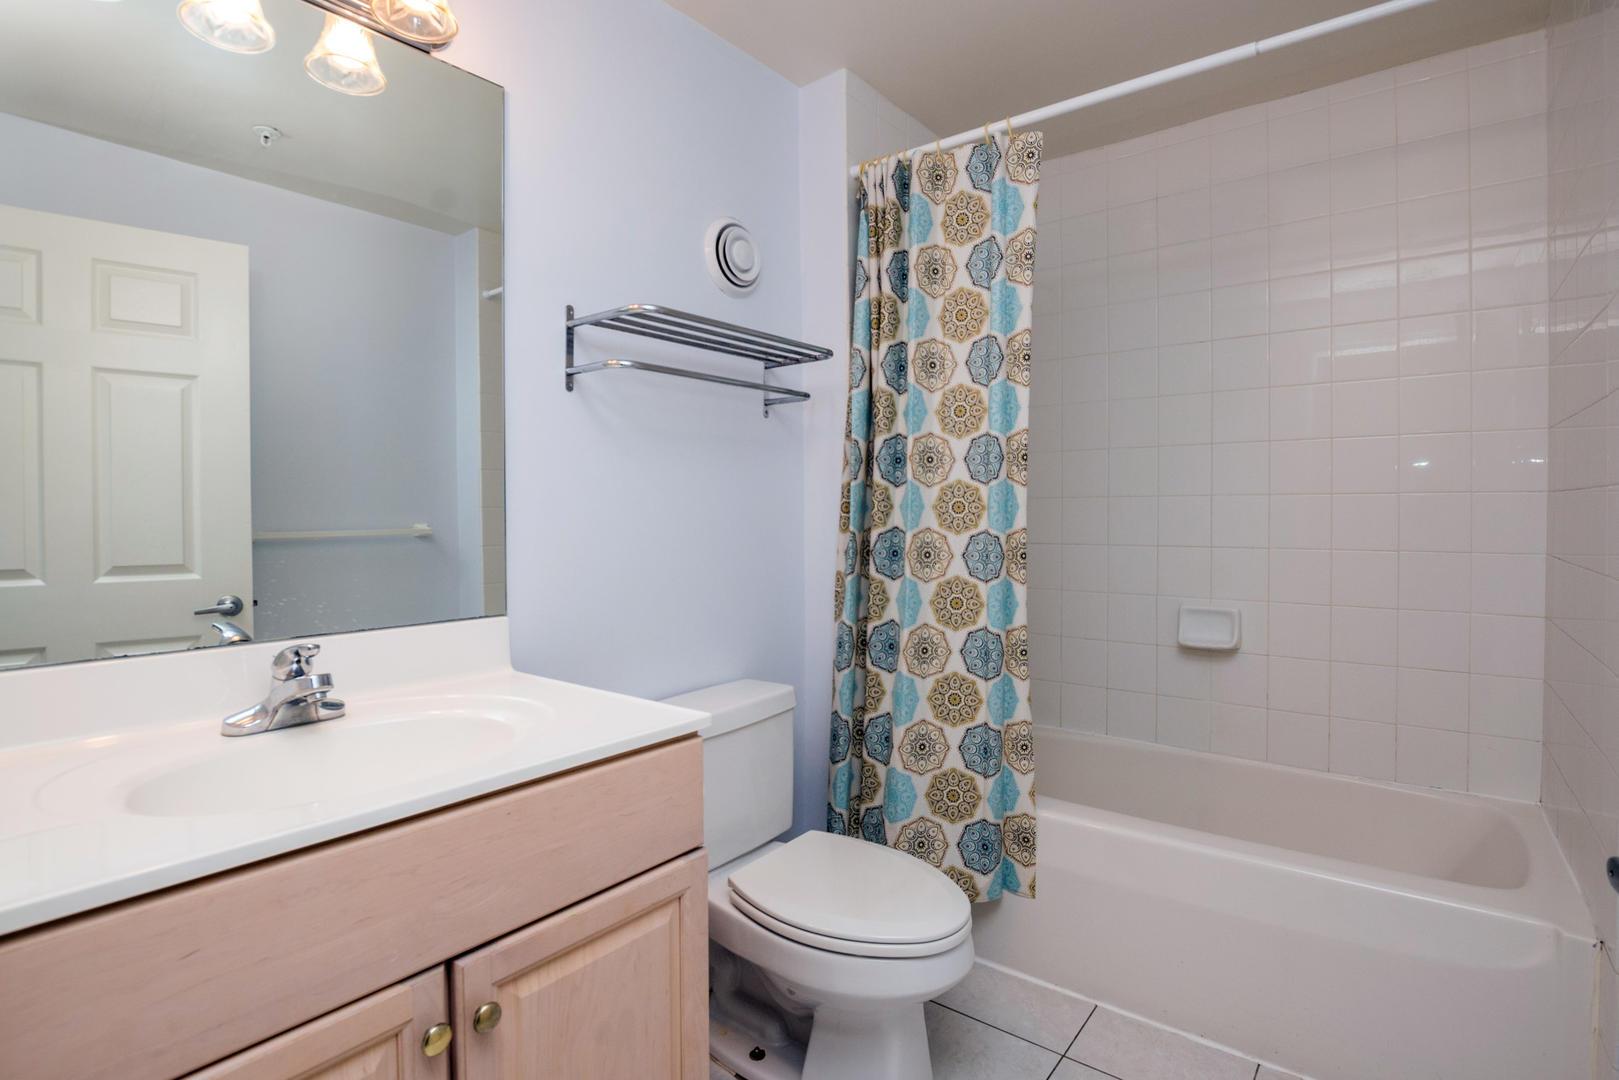 Maresol 309 - Bathroom 2